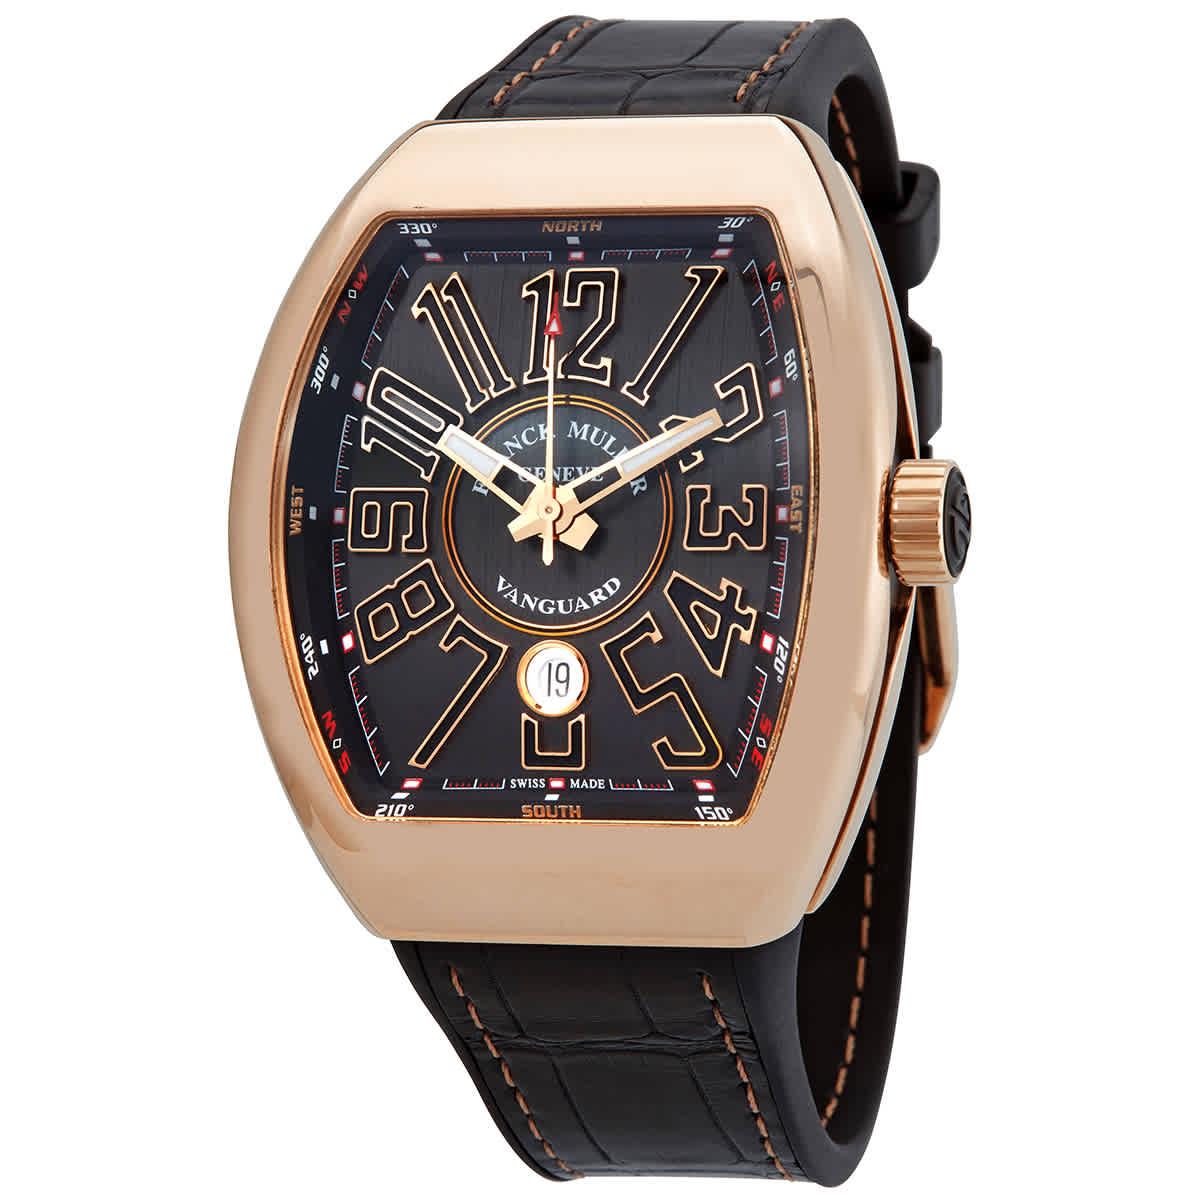 Franck Muller Vanguard Black Dial Unisex Watch V45scdt(5nnr)